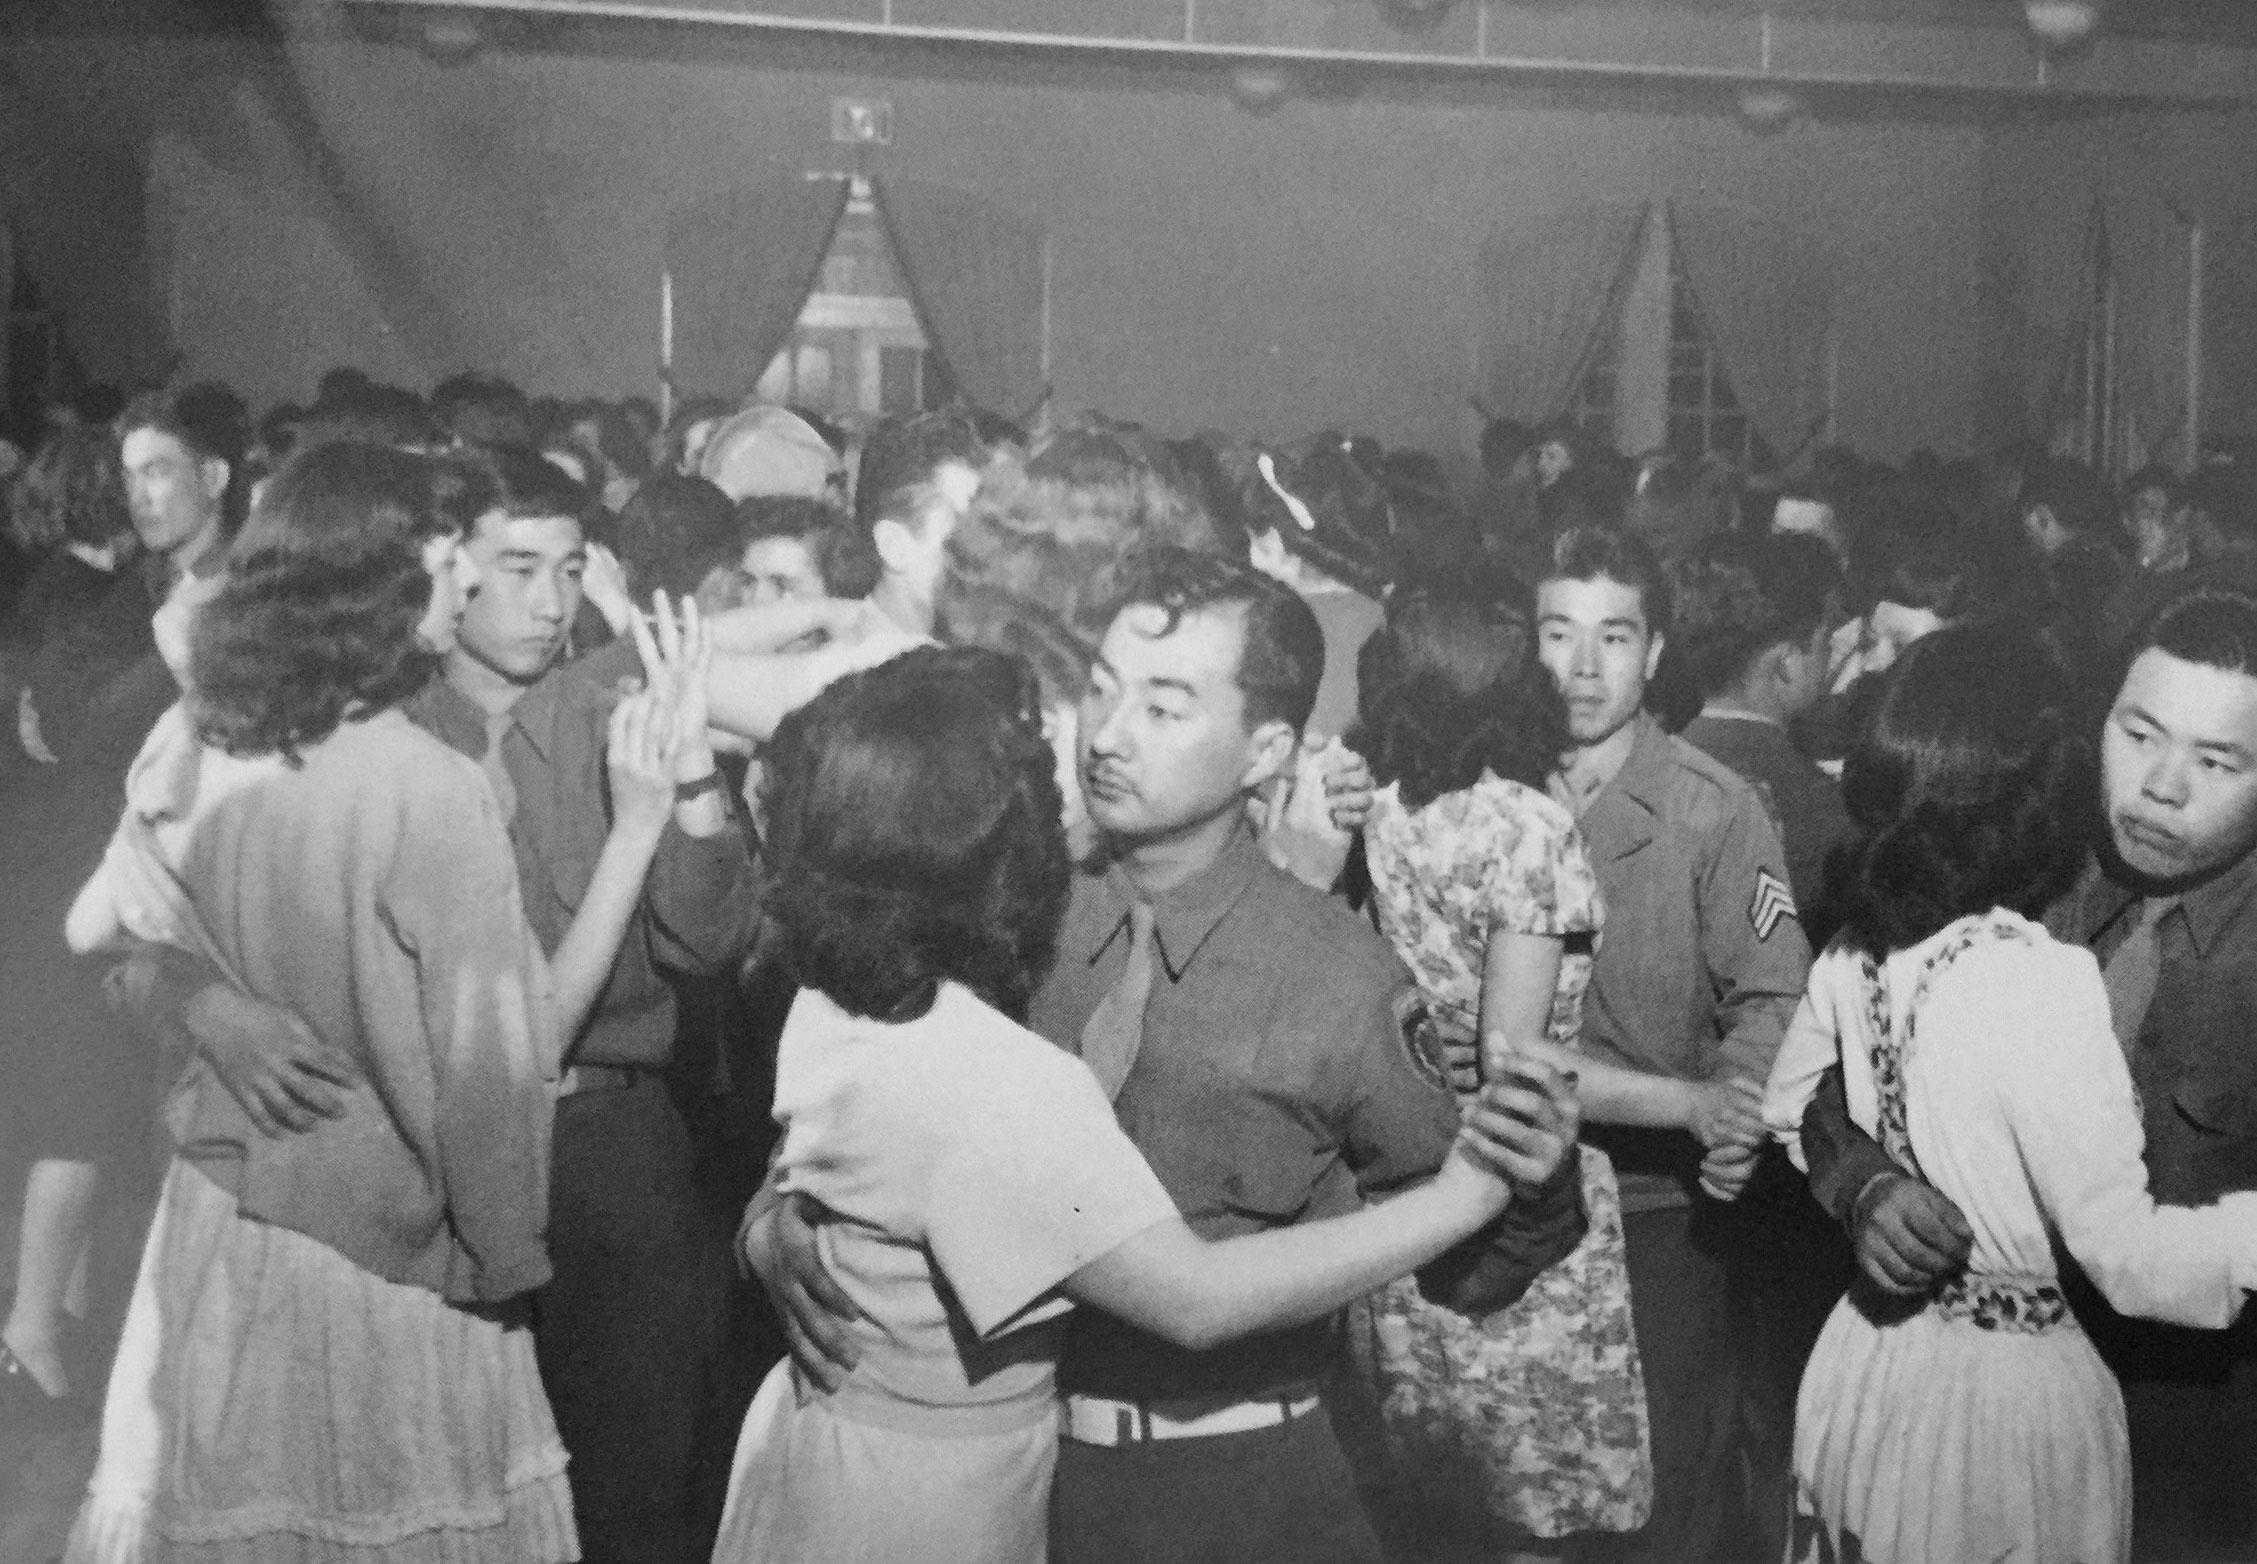 Dance party organized by MILS. Photo courtesy of Bill Doi